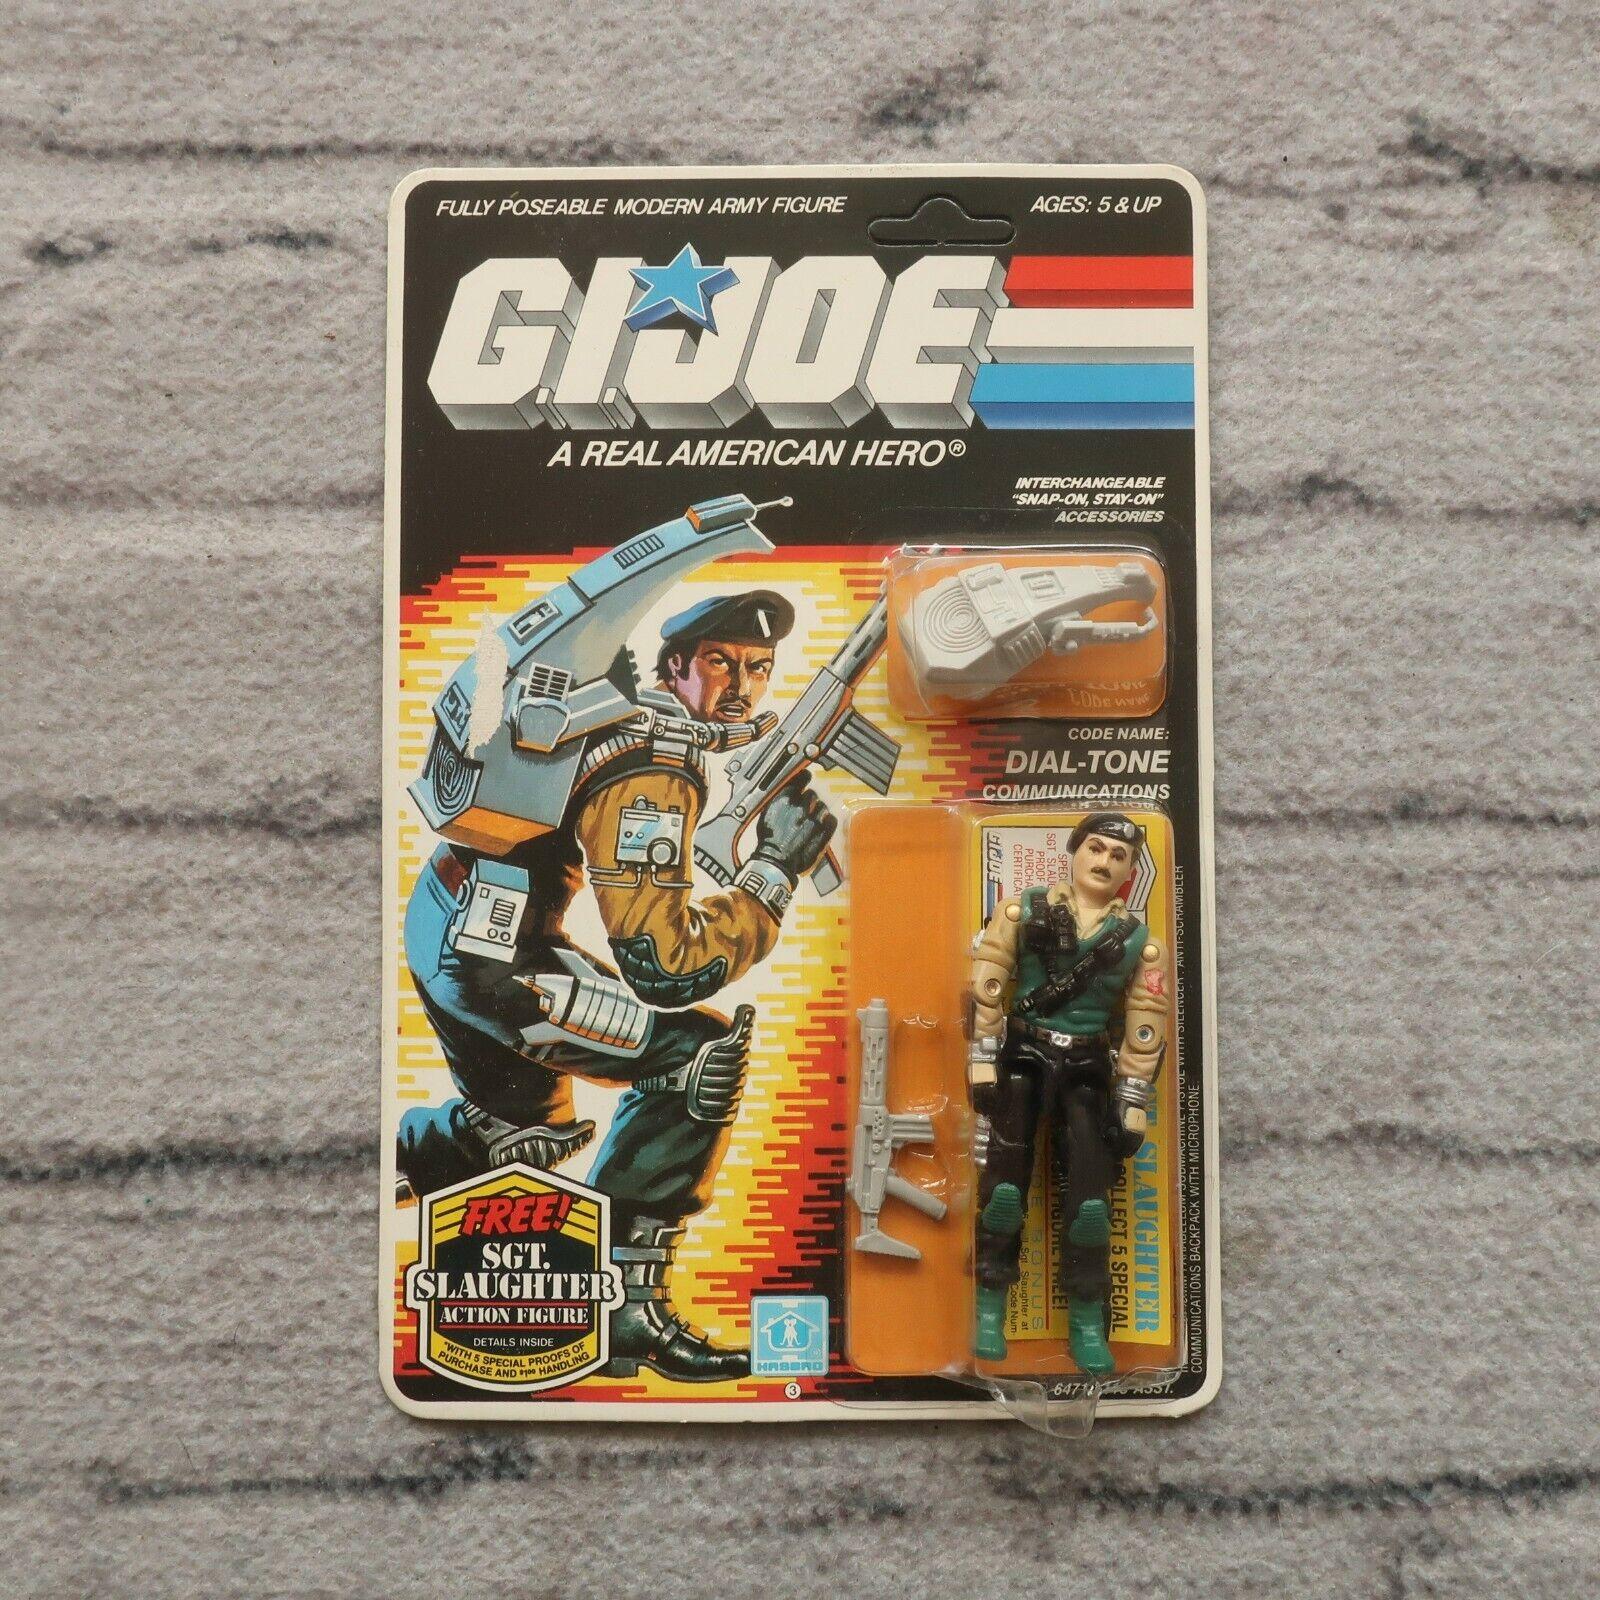 New Vintage GI Joe Dial Tone Sealed On Card 1983 1985 MOC Hasbro